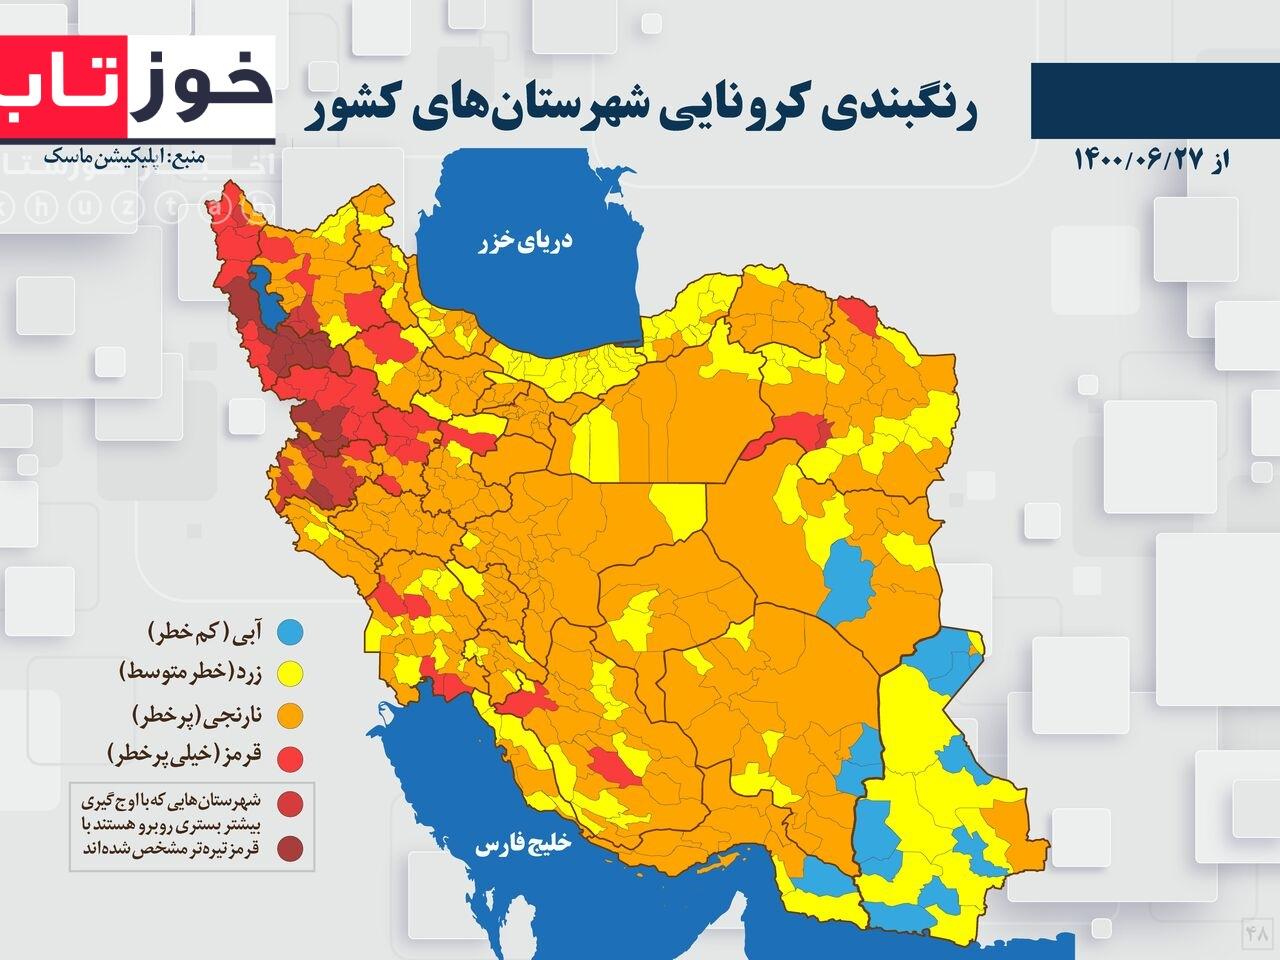 PicsArt 09 17 11.11.46 خروج هشت شهر خوزستان از وضعیت قرمز